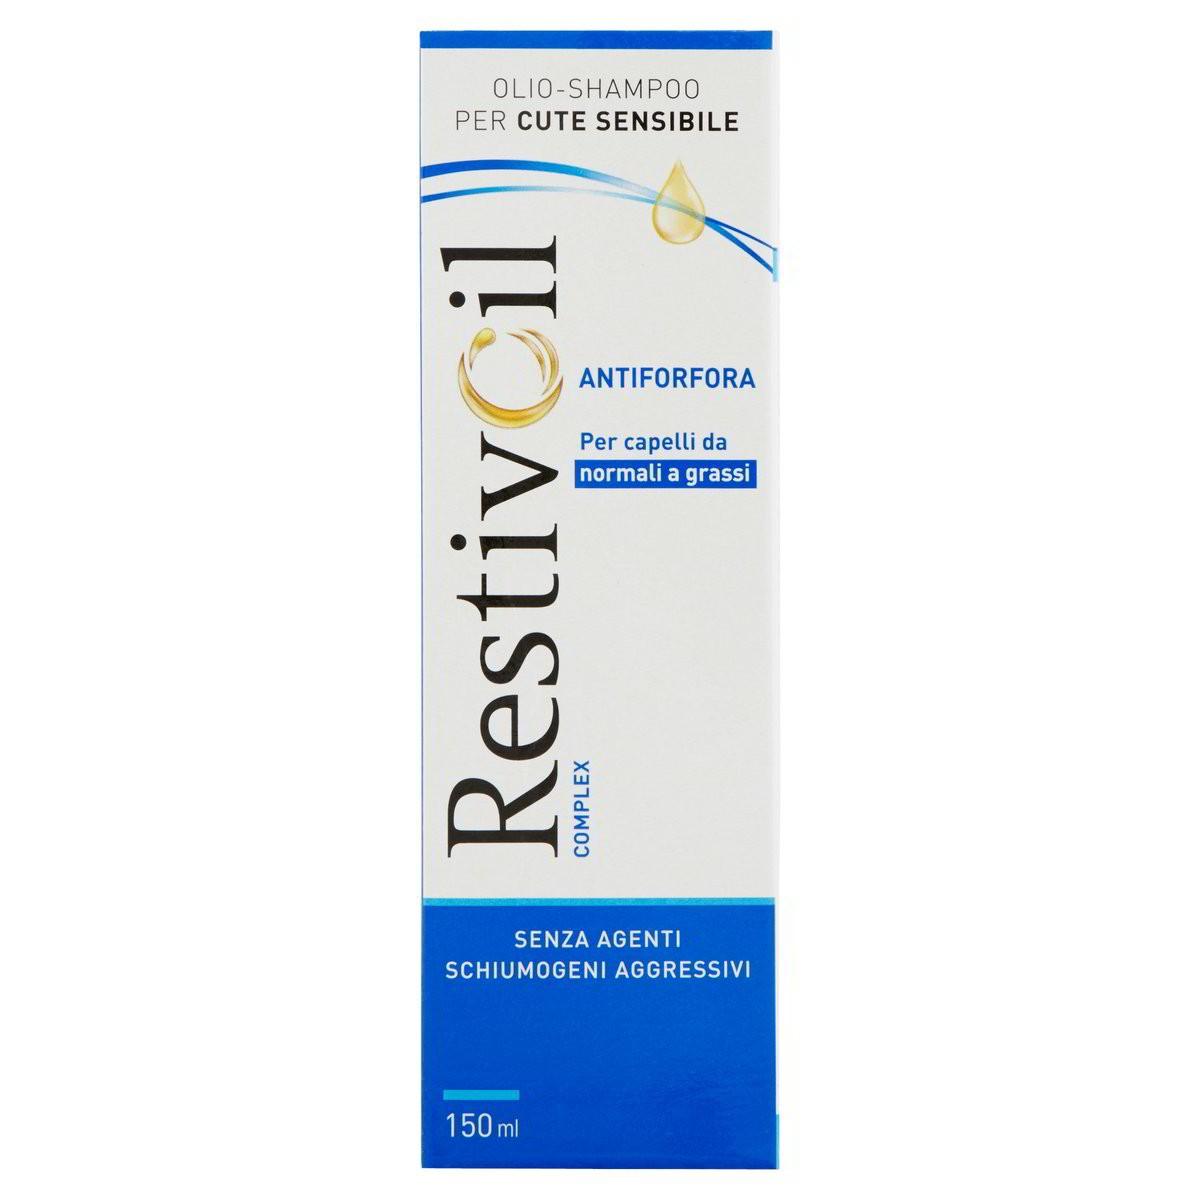 Restivoil Olio-Shampoo Antiforfora